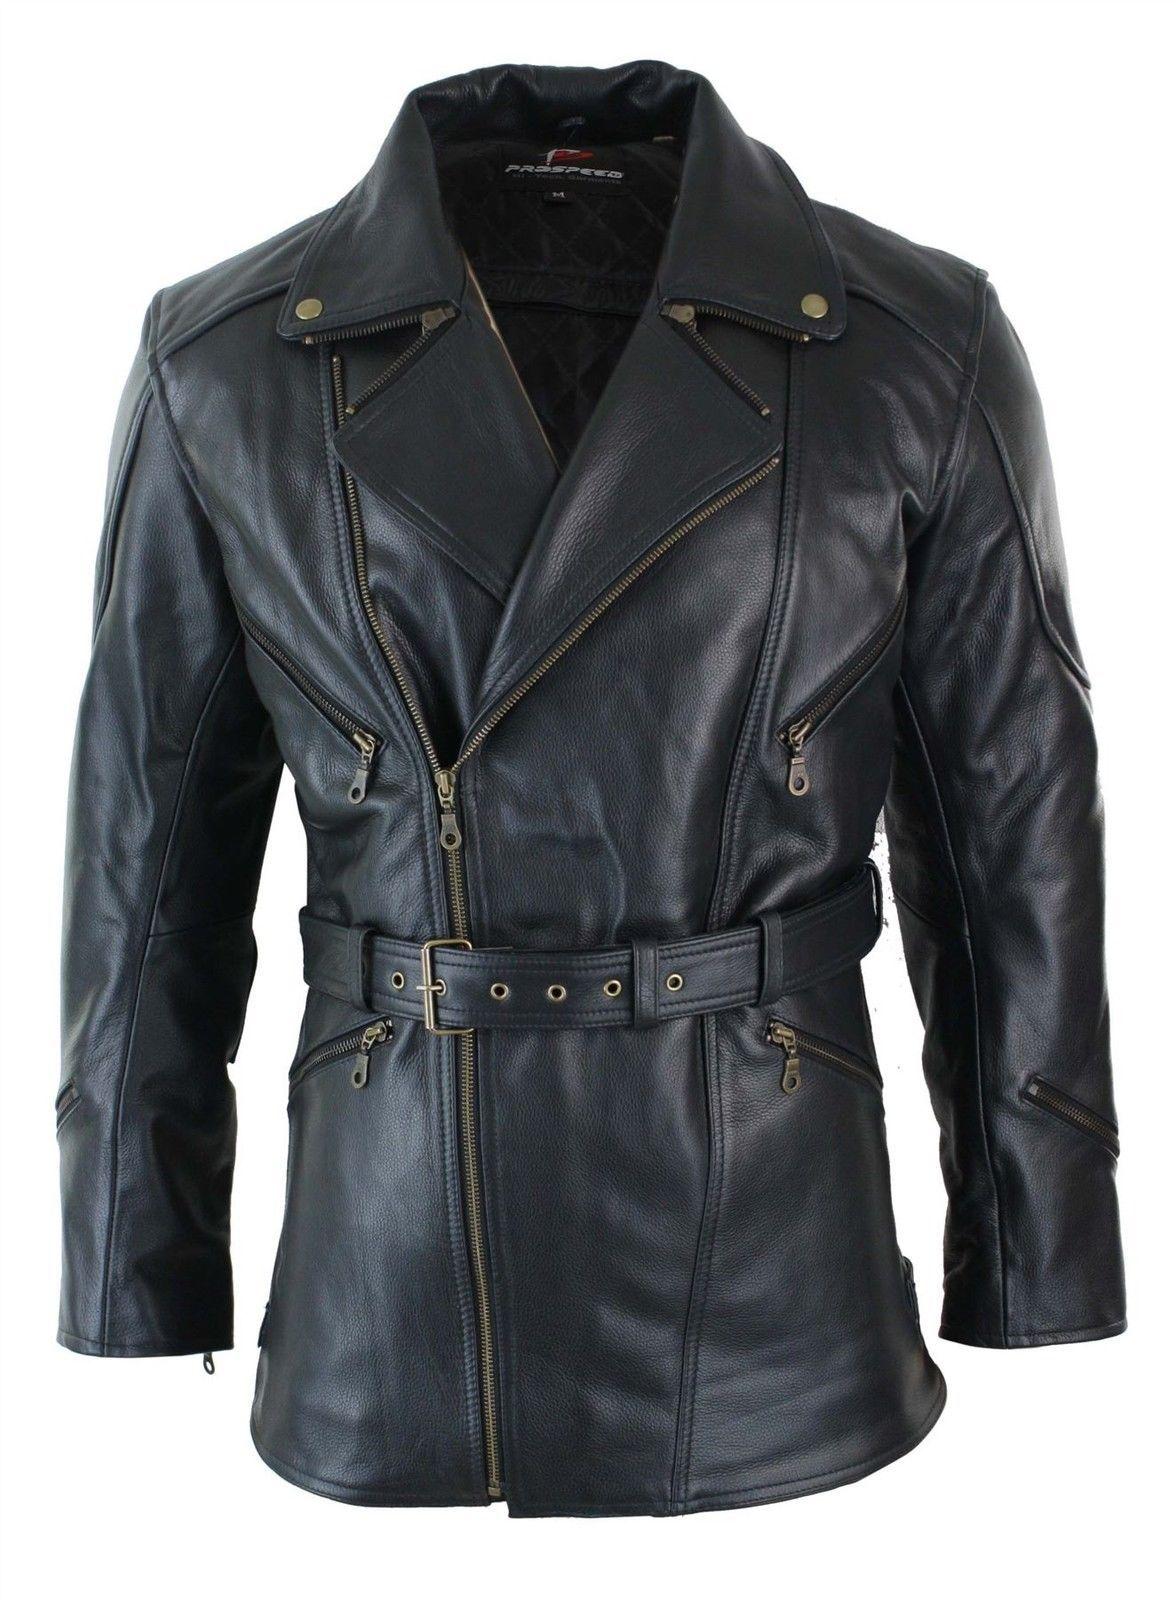 9604449d178 Mens Cross Zip Belted Black 3/4 Motorcycle Biker Long Leather Jacket CE  Armour   eBay